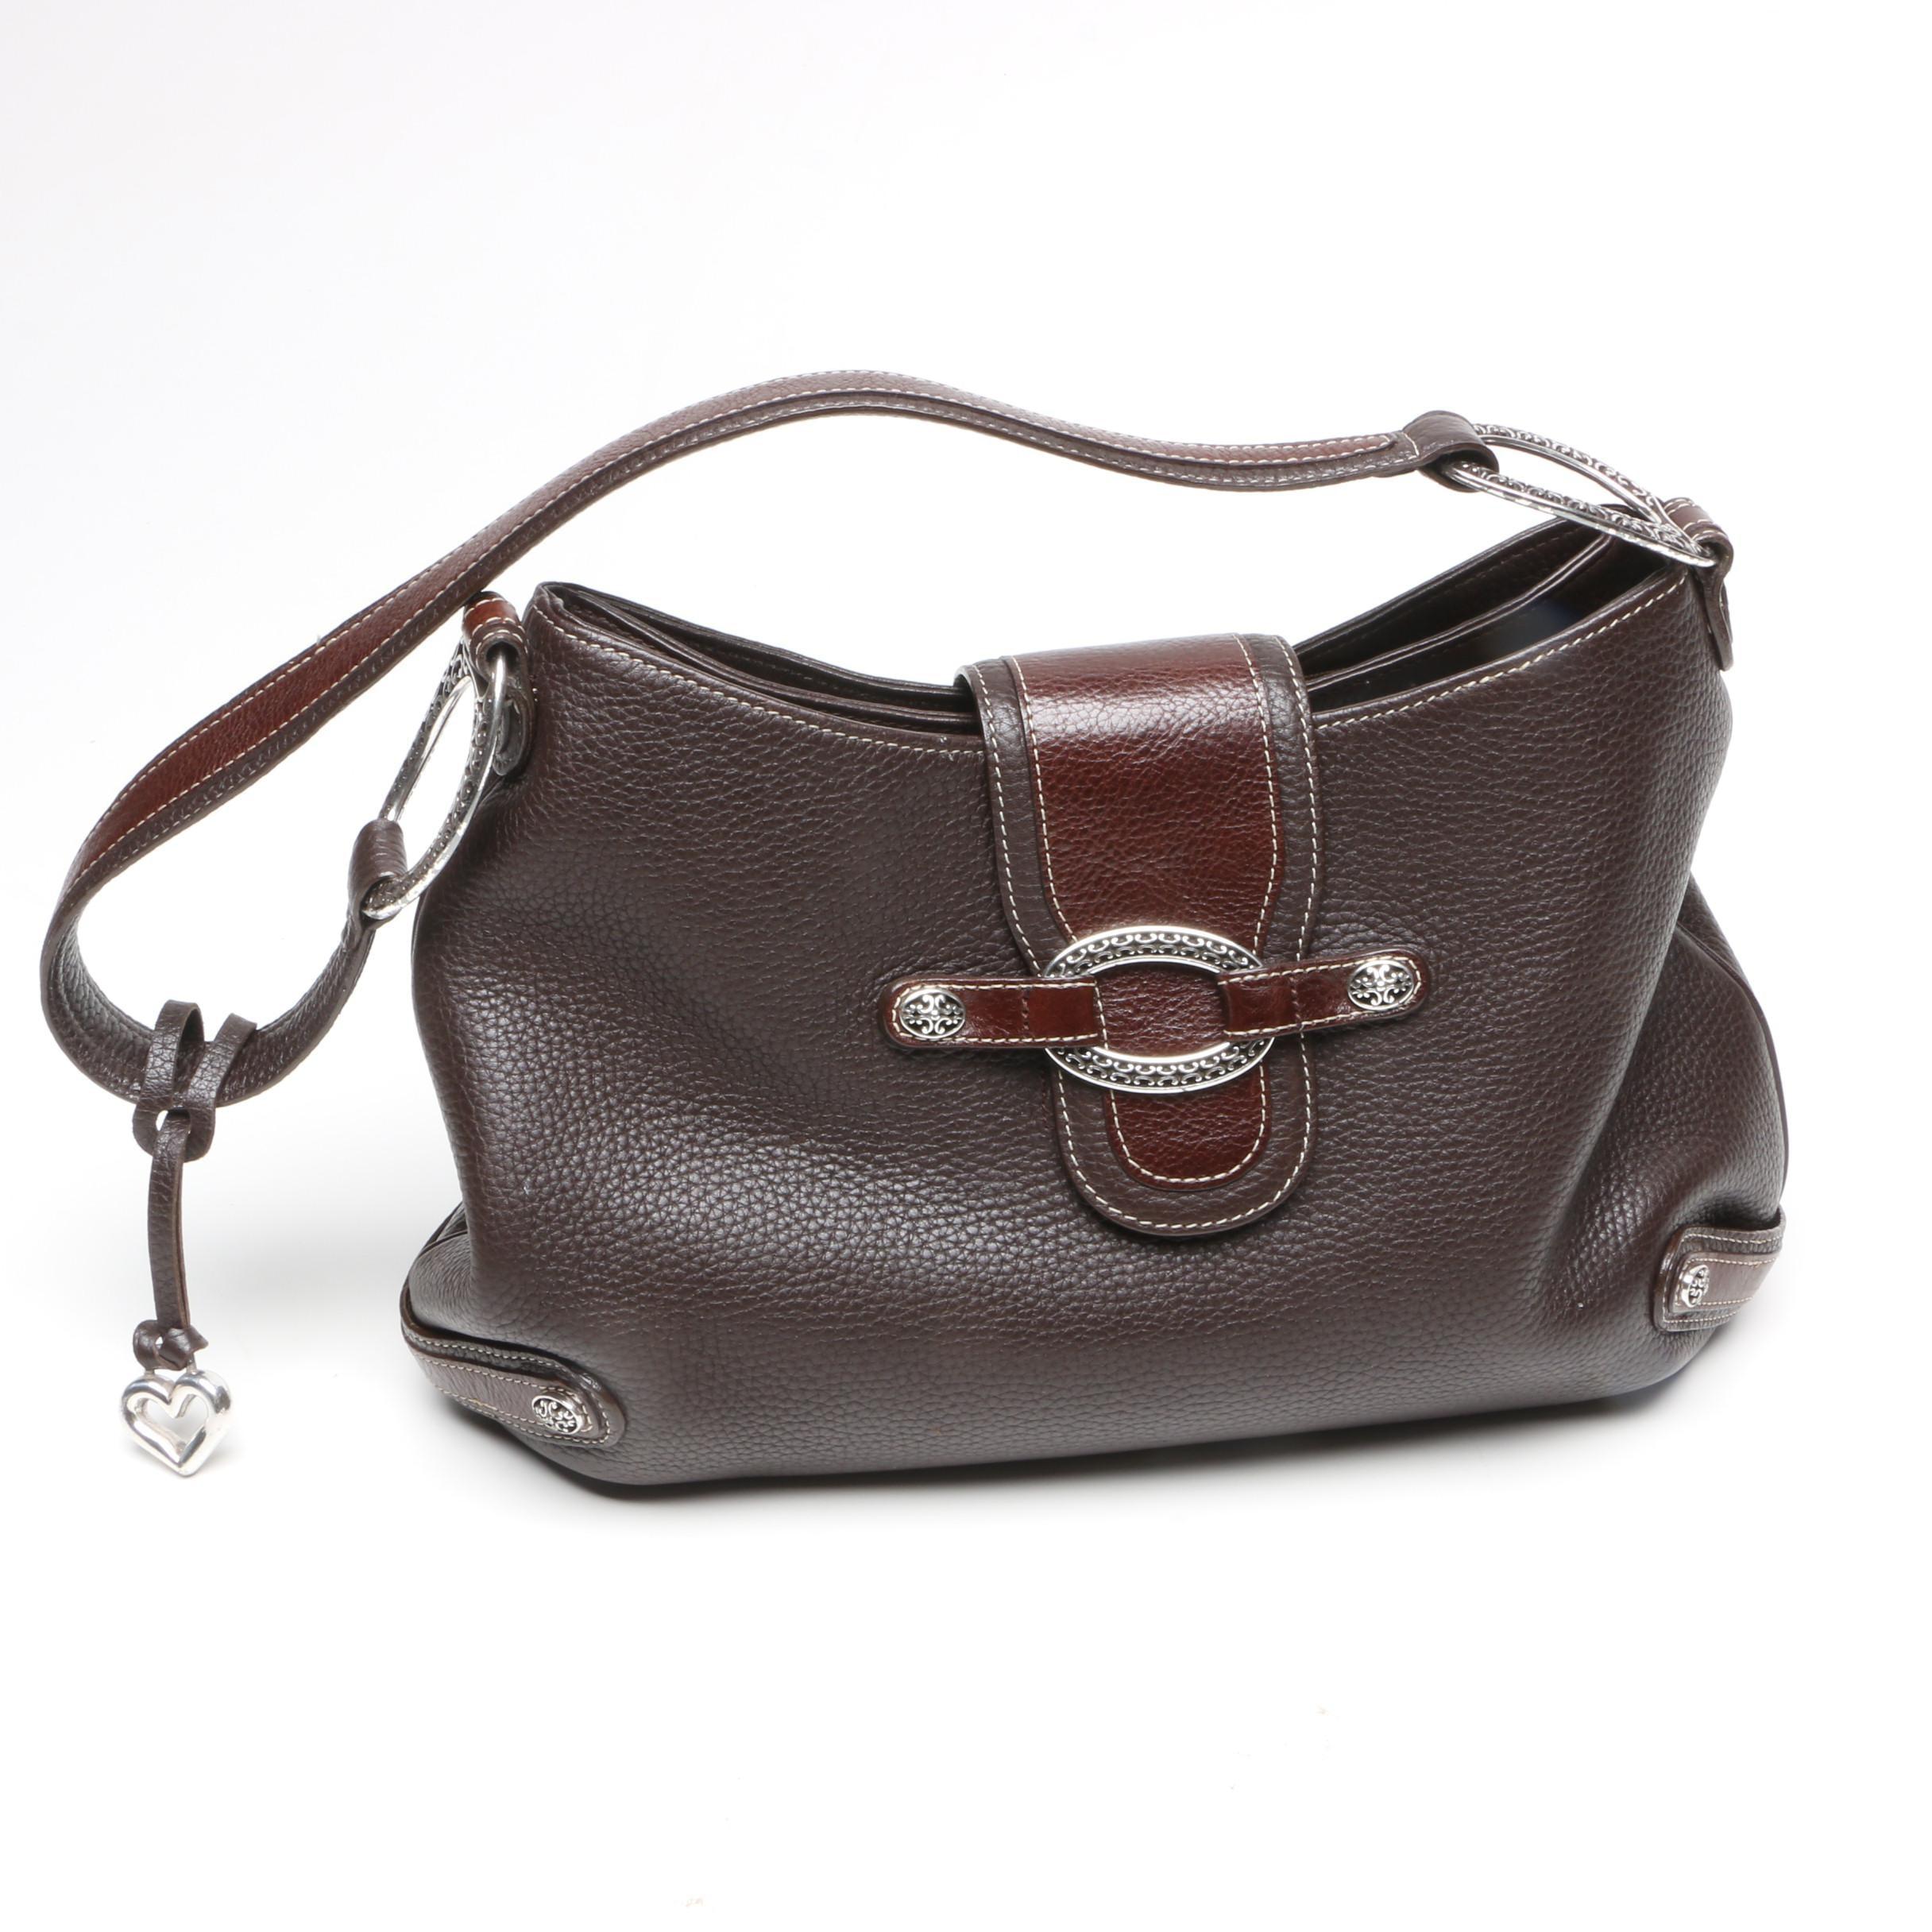 Brighton Selena Two-Tone Brown Leather Purse